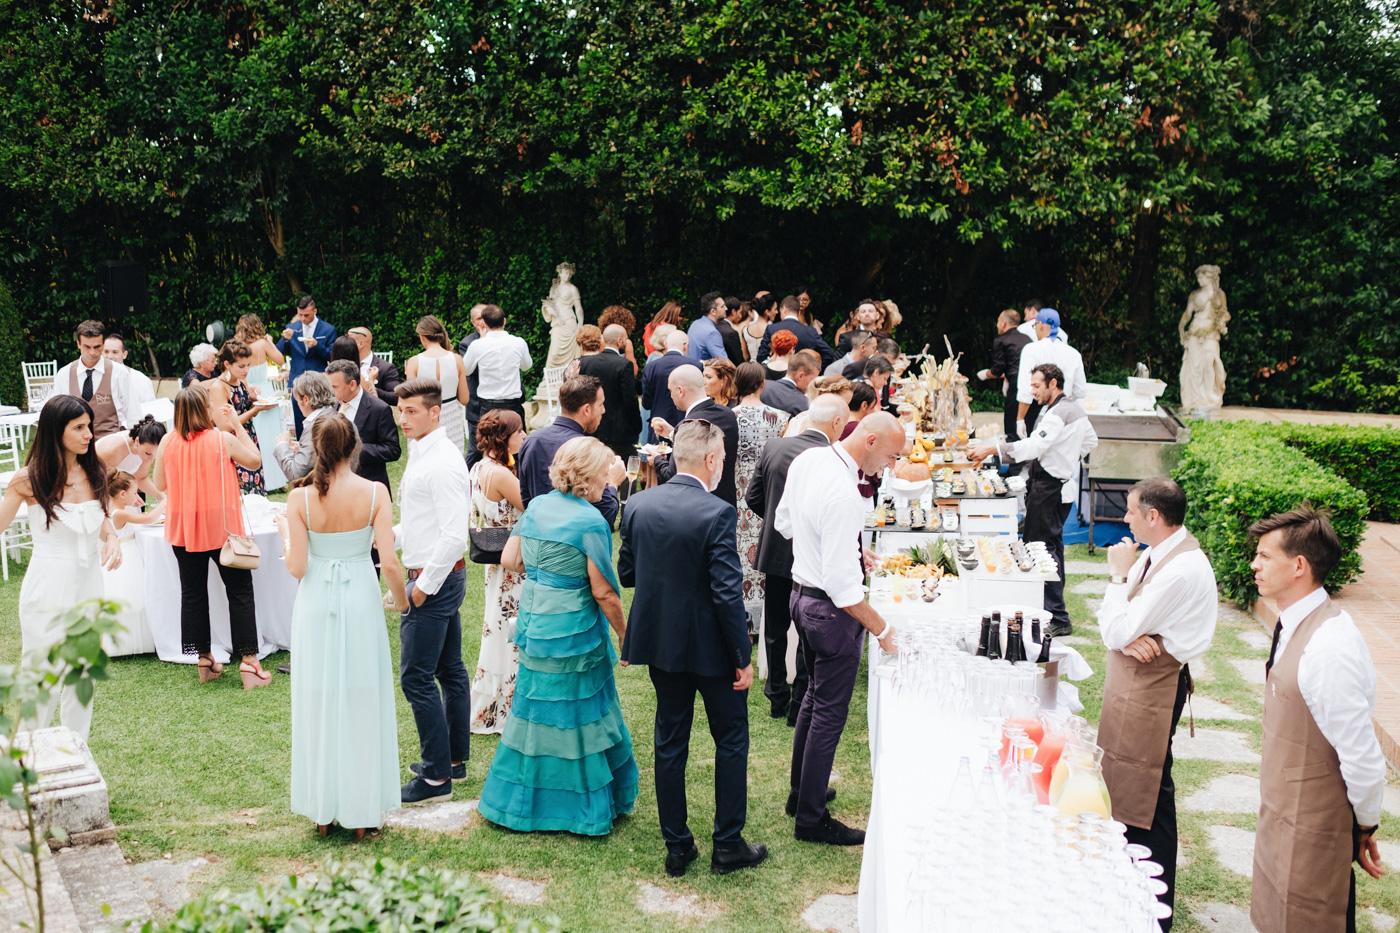 Matrimoni all'italiana wedding photographer italy-112.jpg